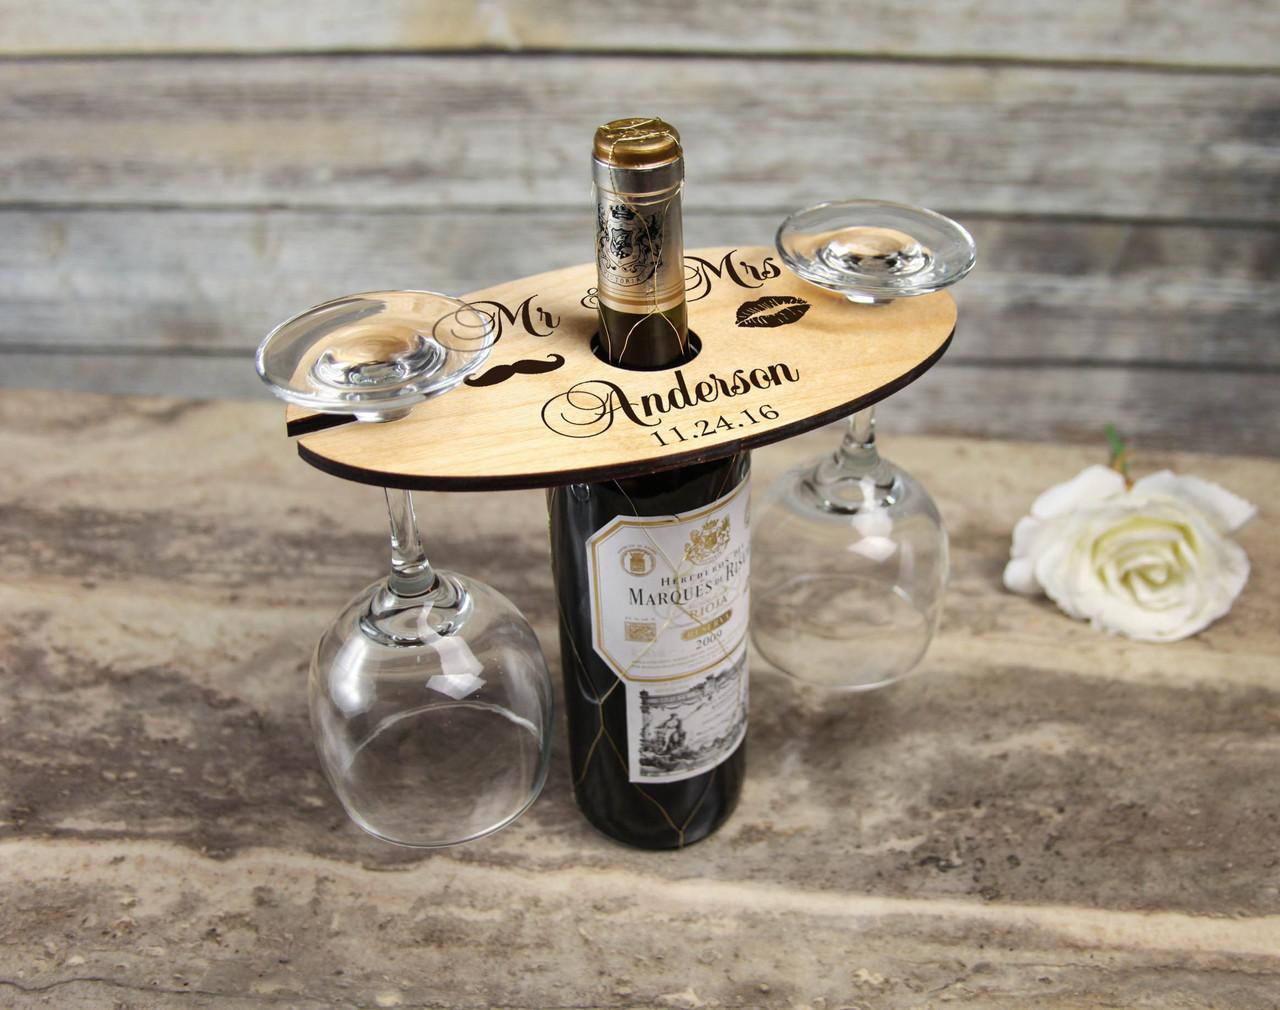 Groupon AU/NZ - Personalized Wine Caddy & Glass holder - Mr & Mrs